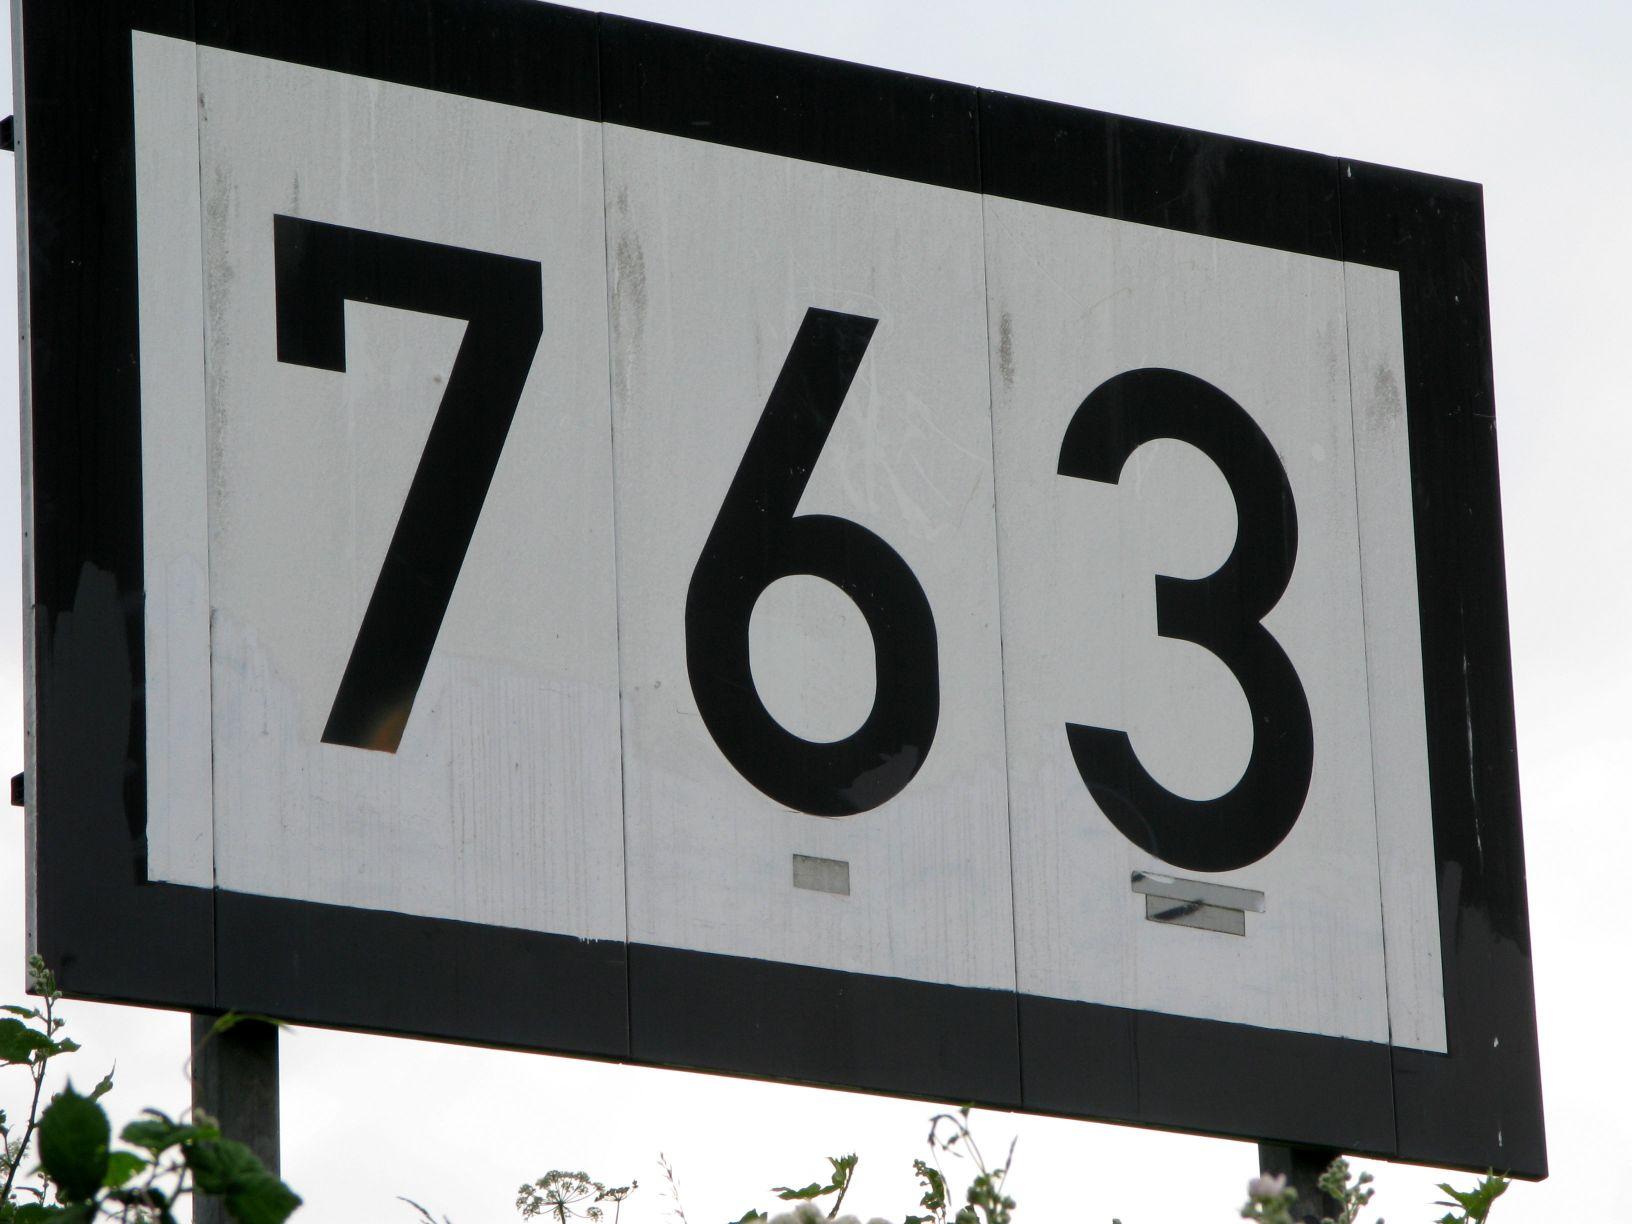 rheinkilometer-763